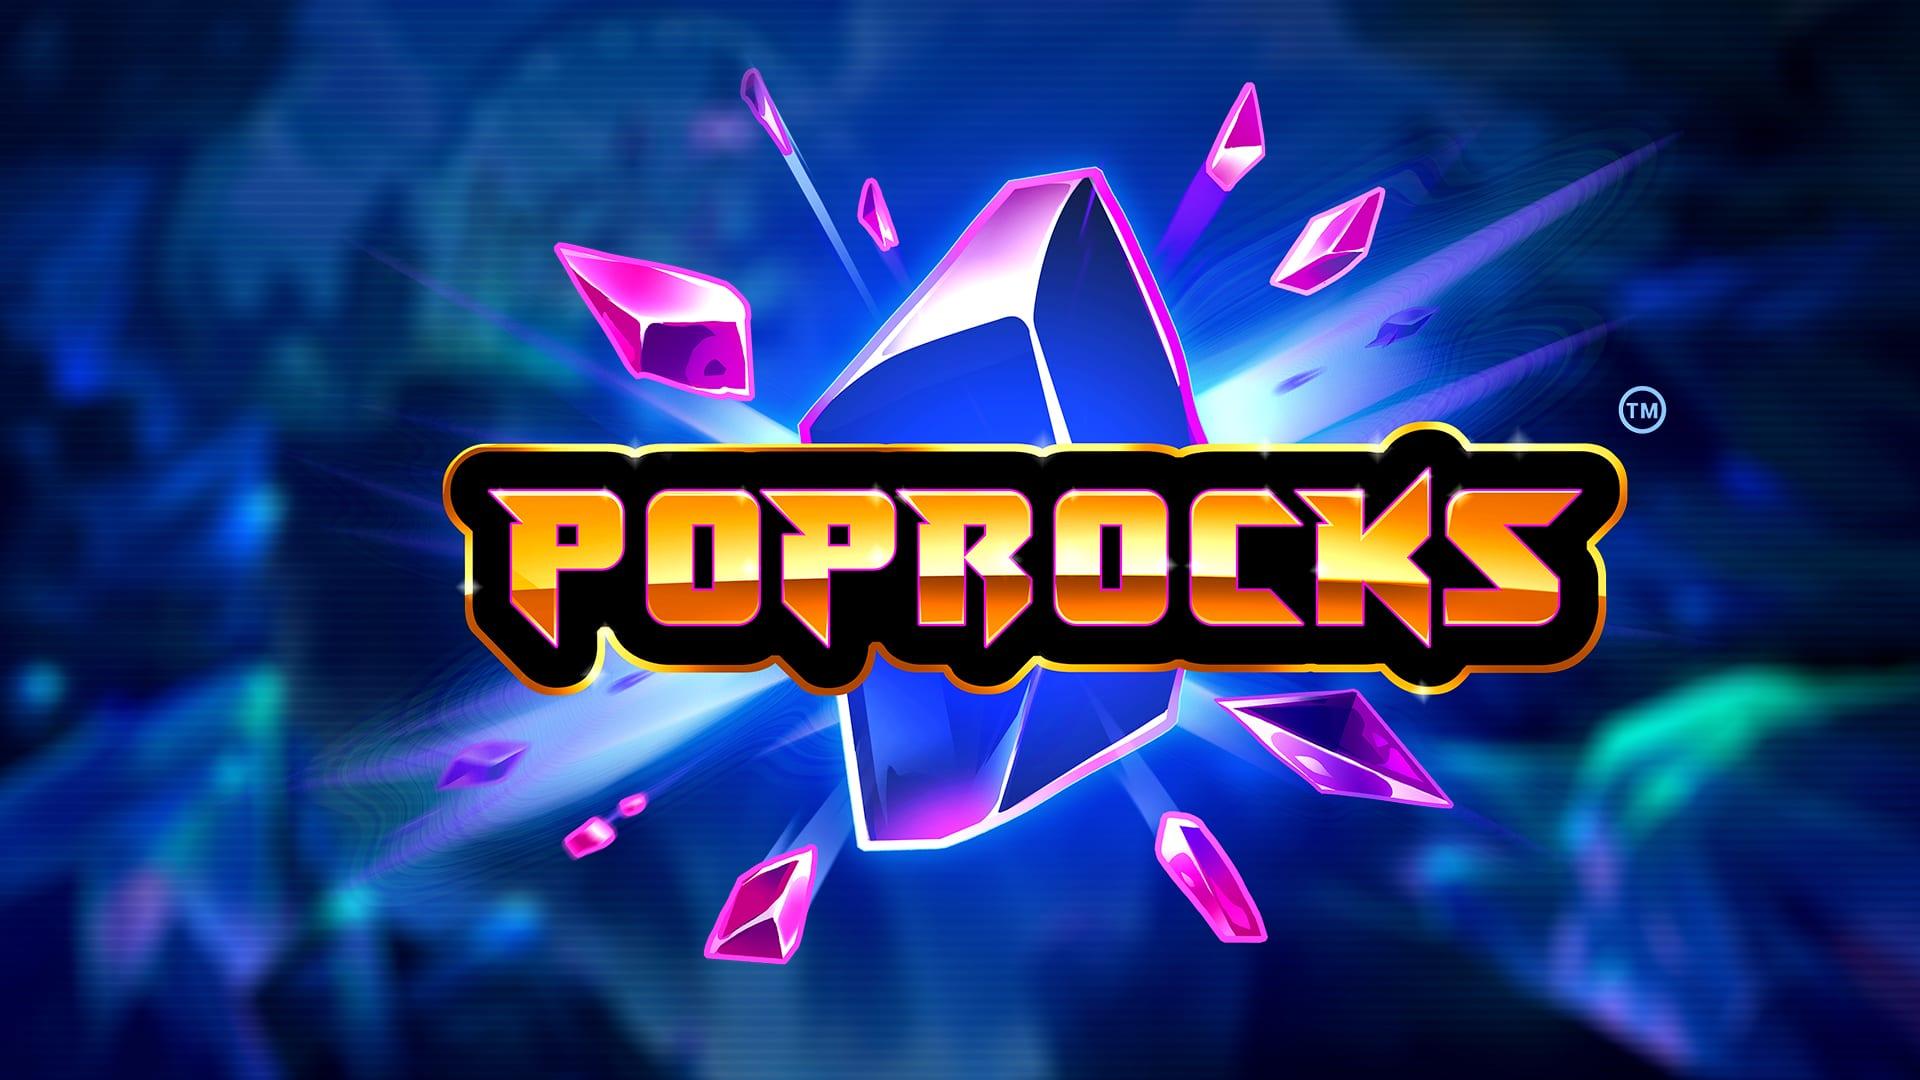 Poprocks Slot Wizard Slots